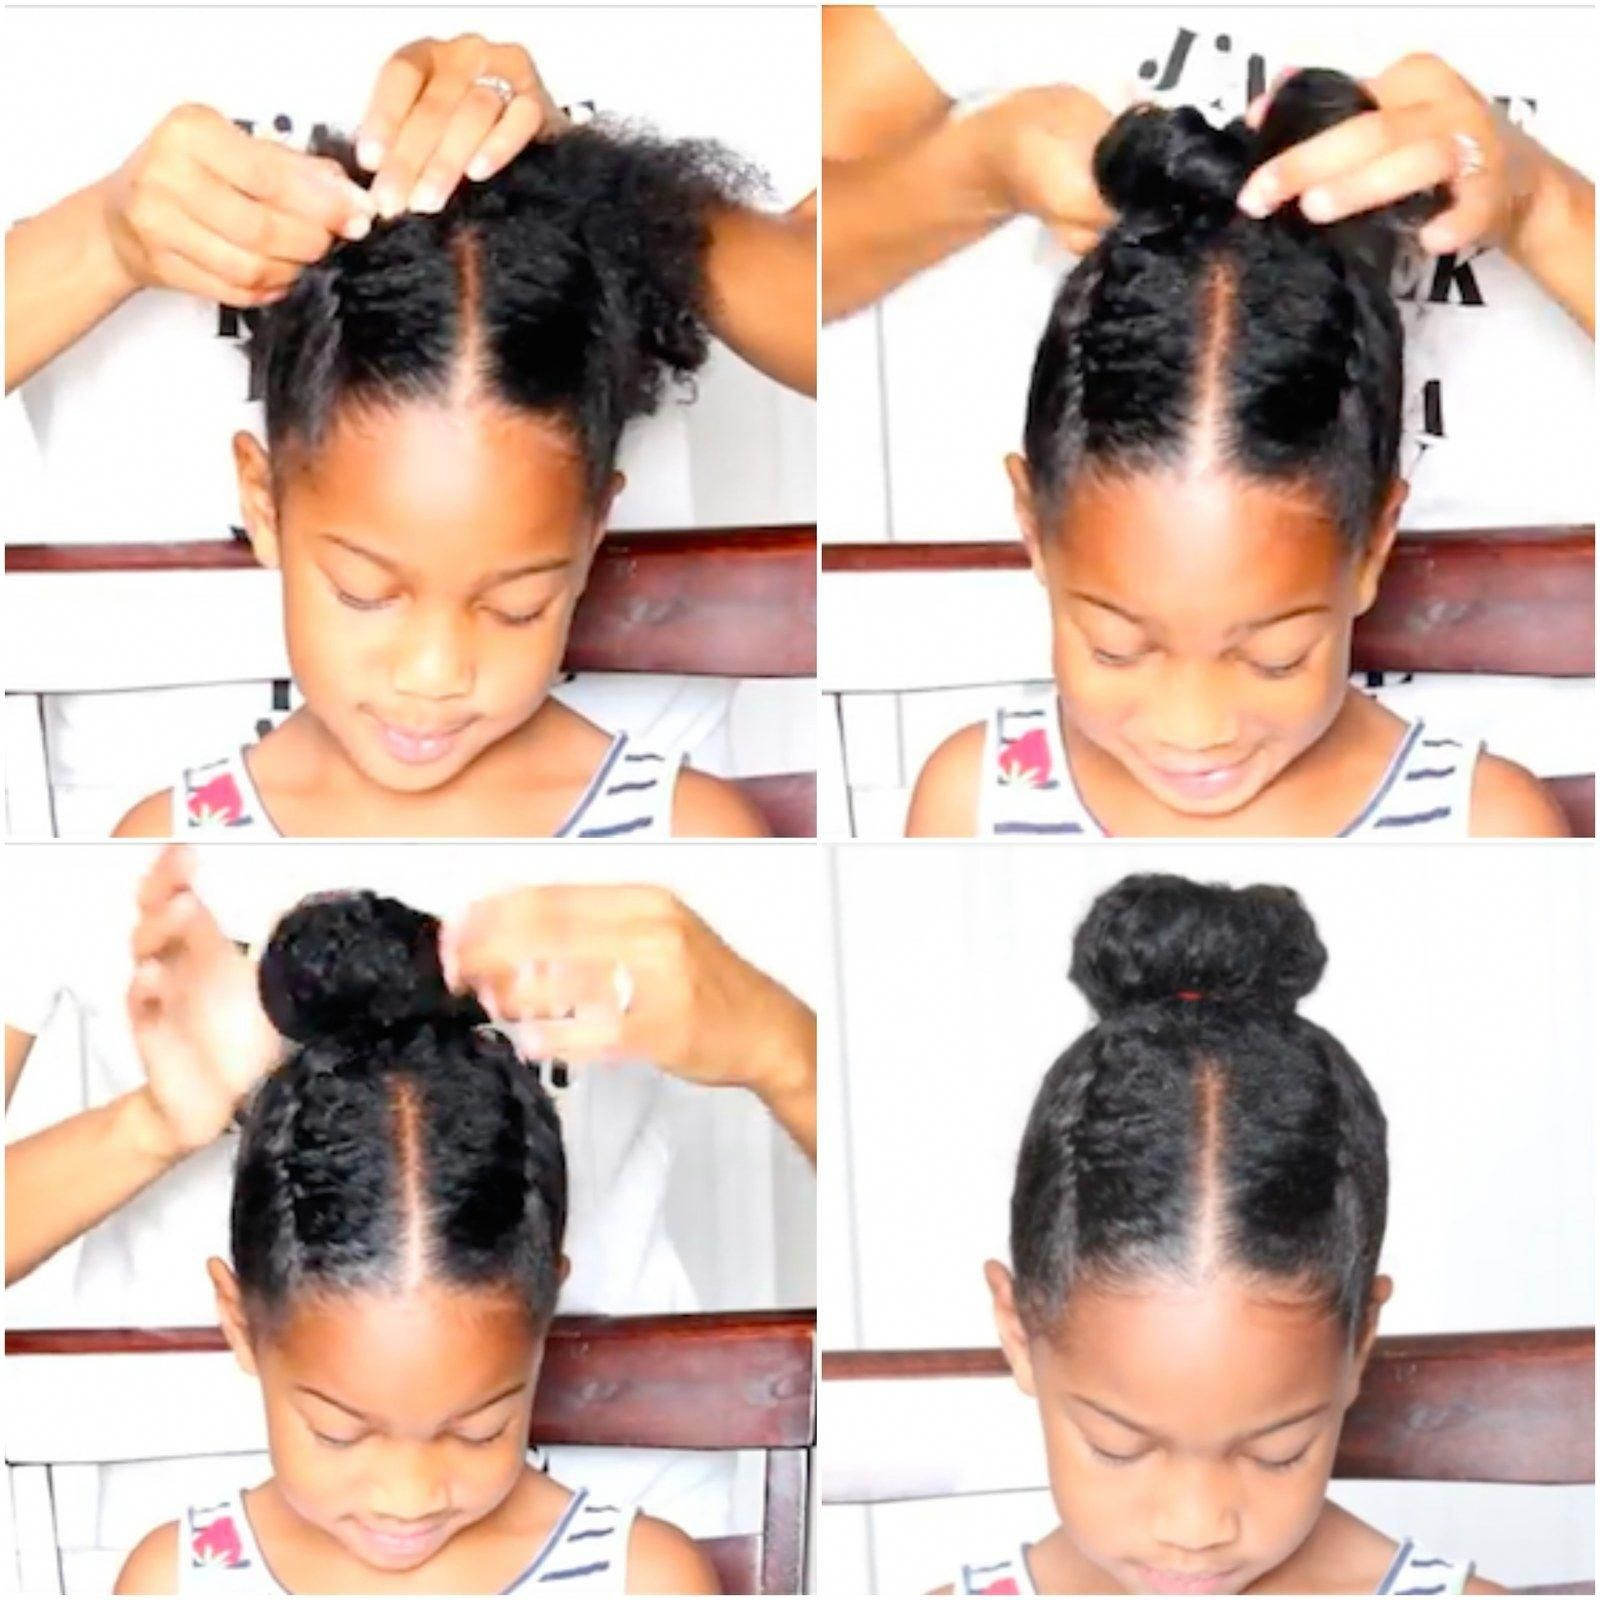 Modern Short Hairstyles | Kids Hairstyles For Girls Medium Hair | Little Girl Short Hair Brai ...